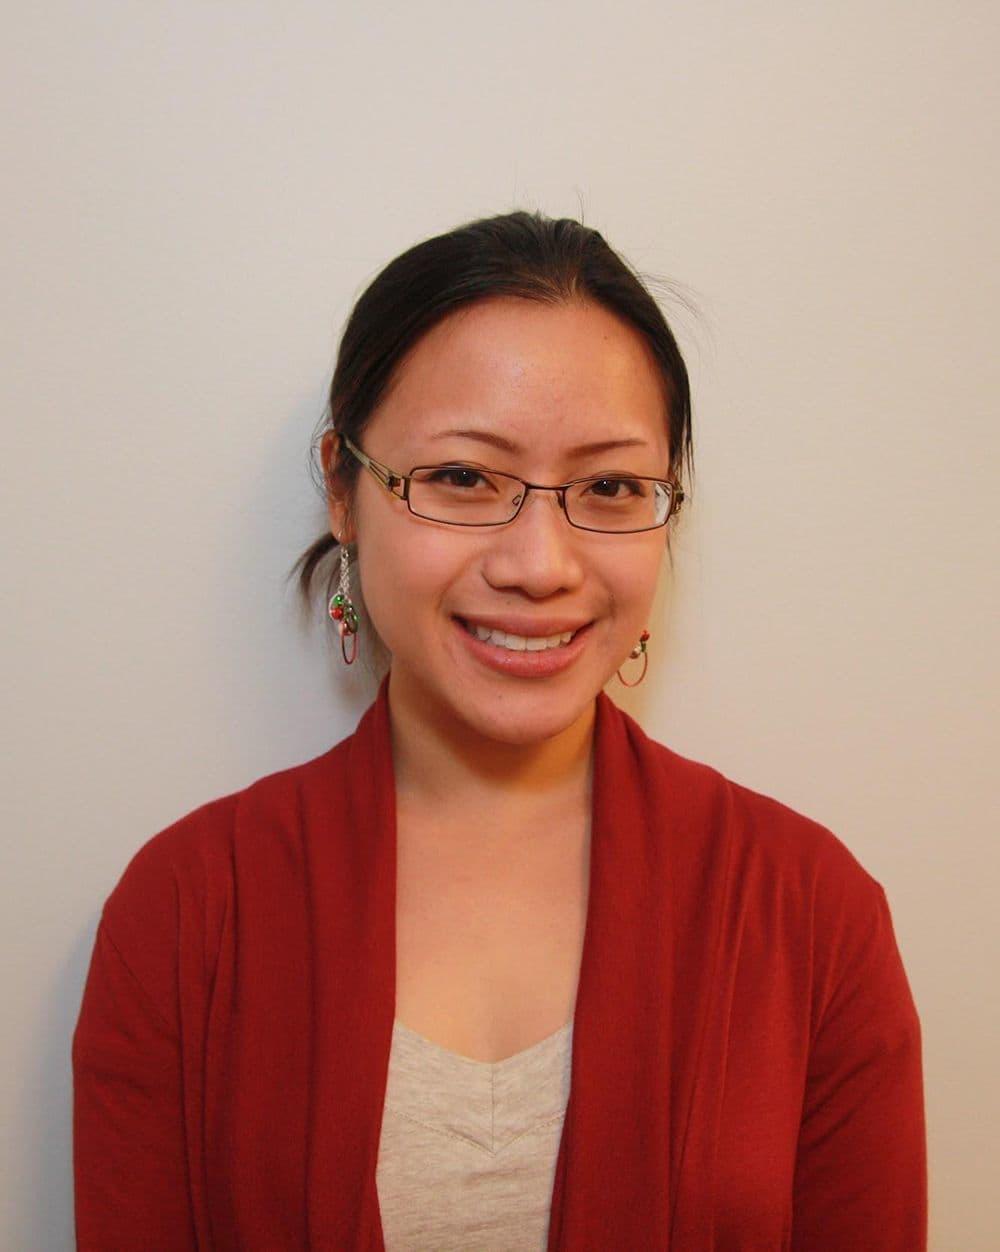 Michelle Cruz - Group Piano & Clarinet Teacher